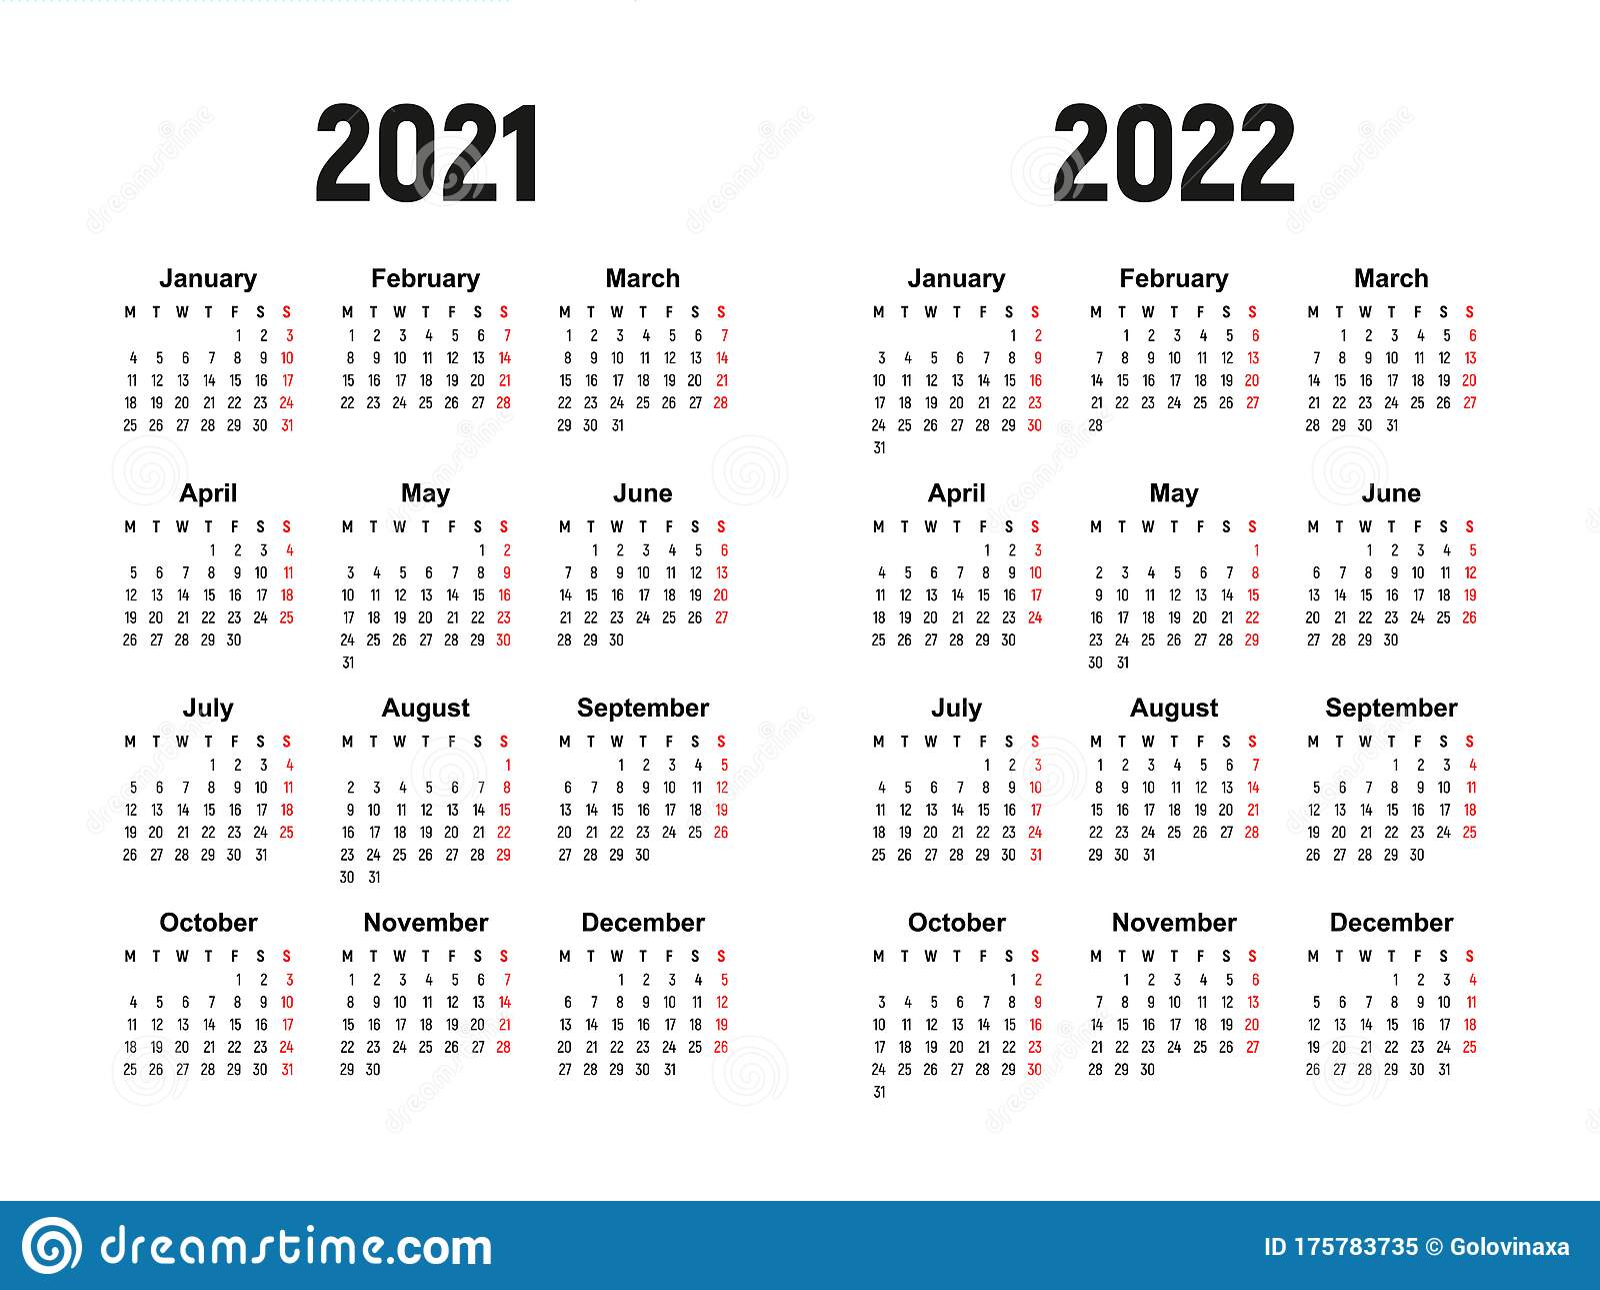 2022 Week Calendar.Calendar 2021 And 2022 Week Starts On Monday Basic Business Template Stock Vector Illustration Of Basic Grid 175783735